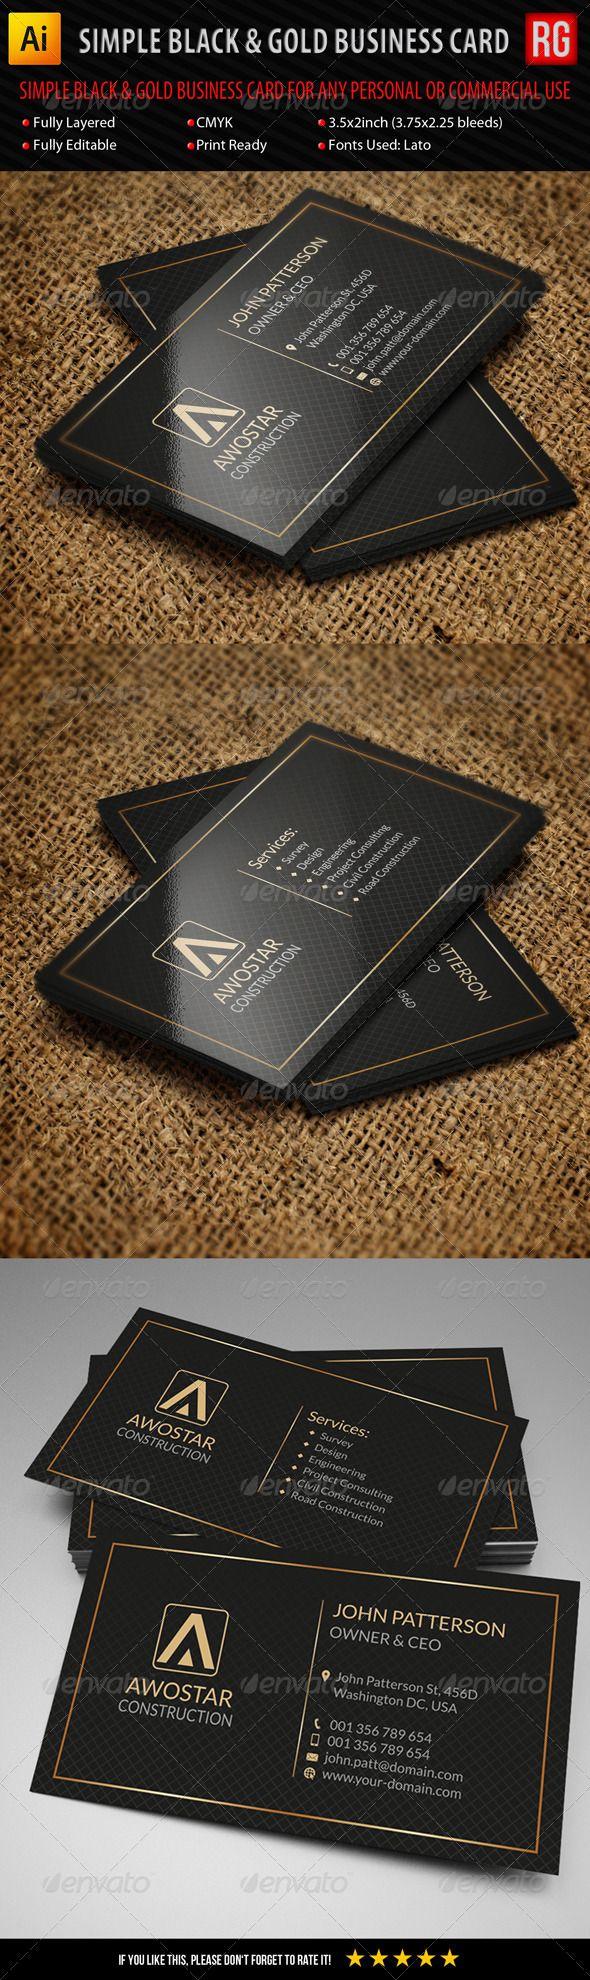 12 best concrete logo images on pinterest black and white simple black gold business card magicingreecefo Images